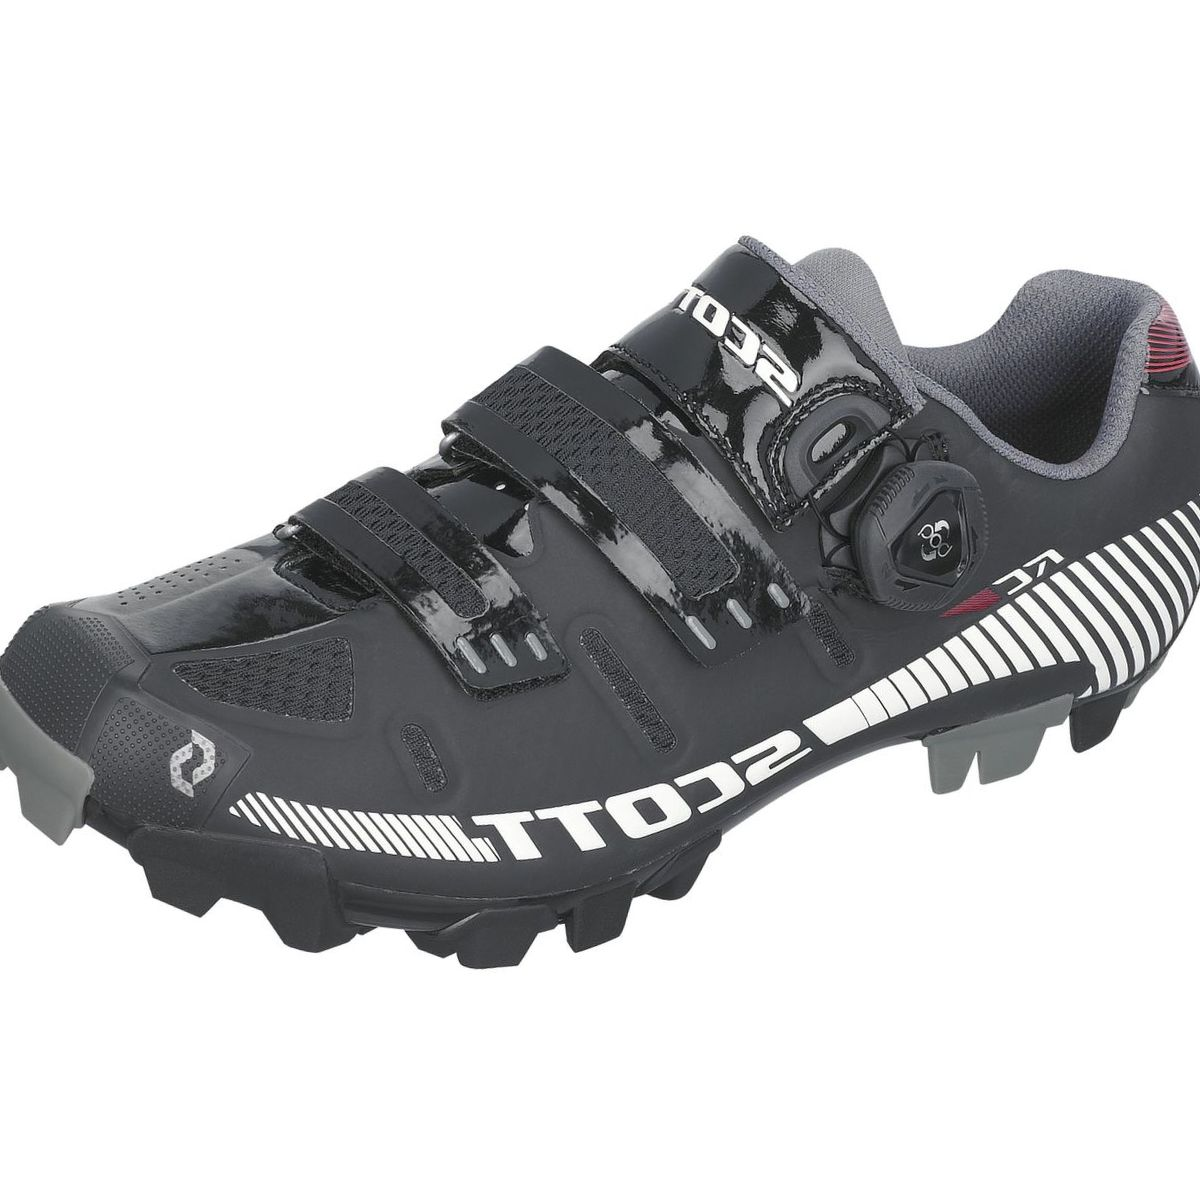 Scott MTB RC Lady Cycling Shoe - Women's